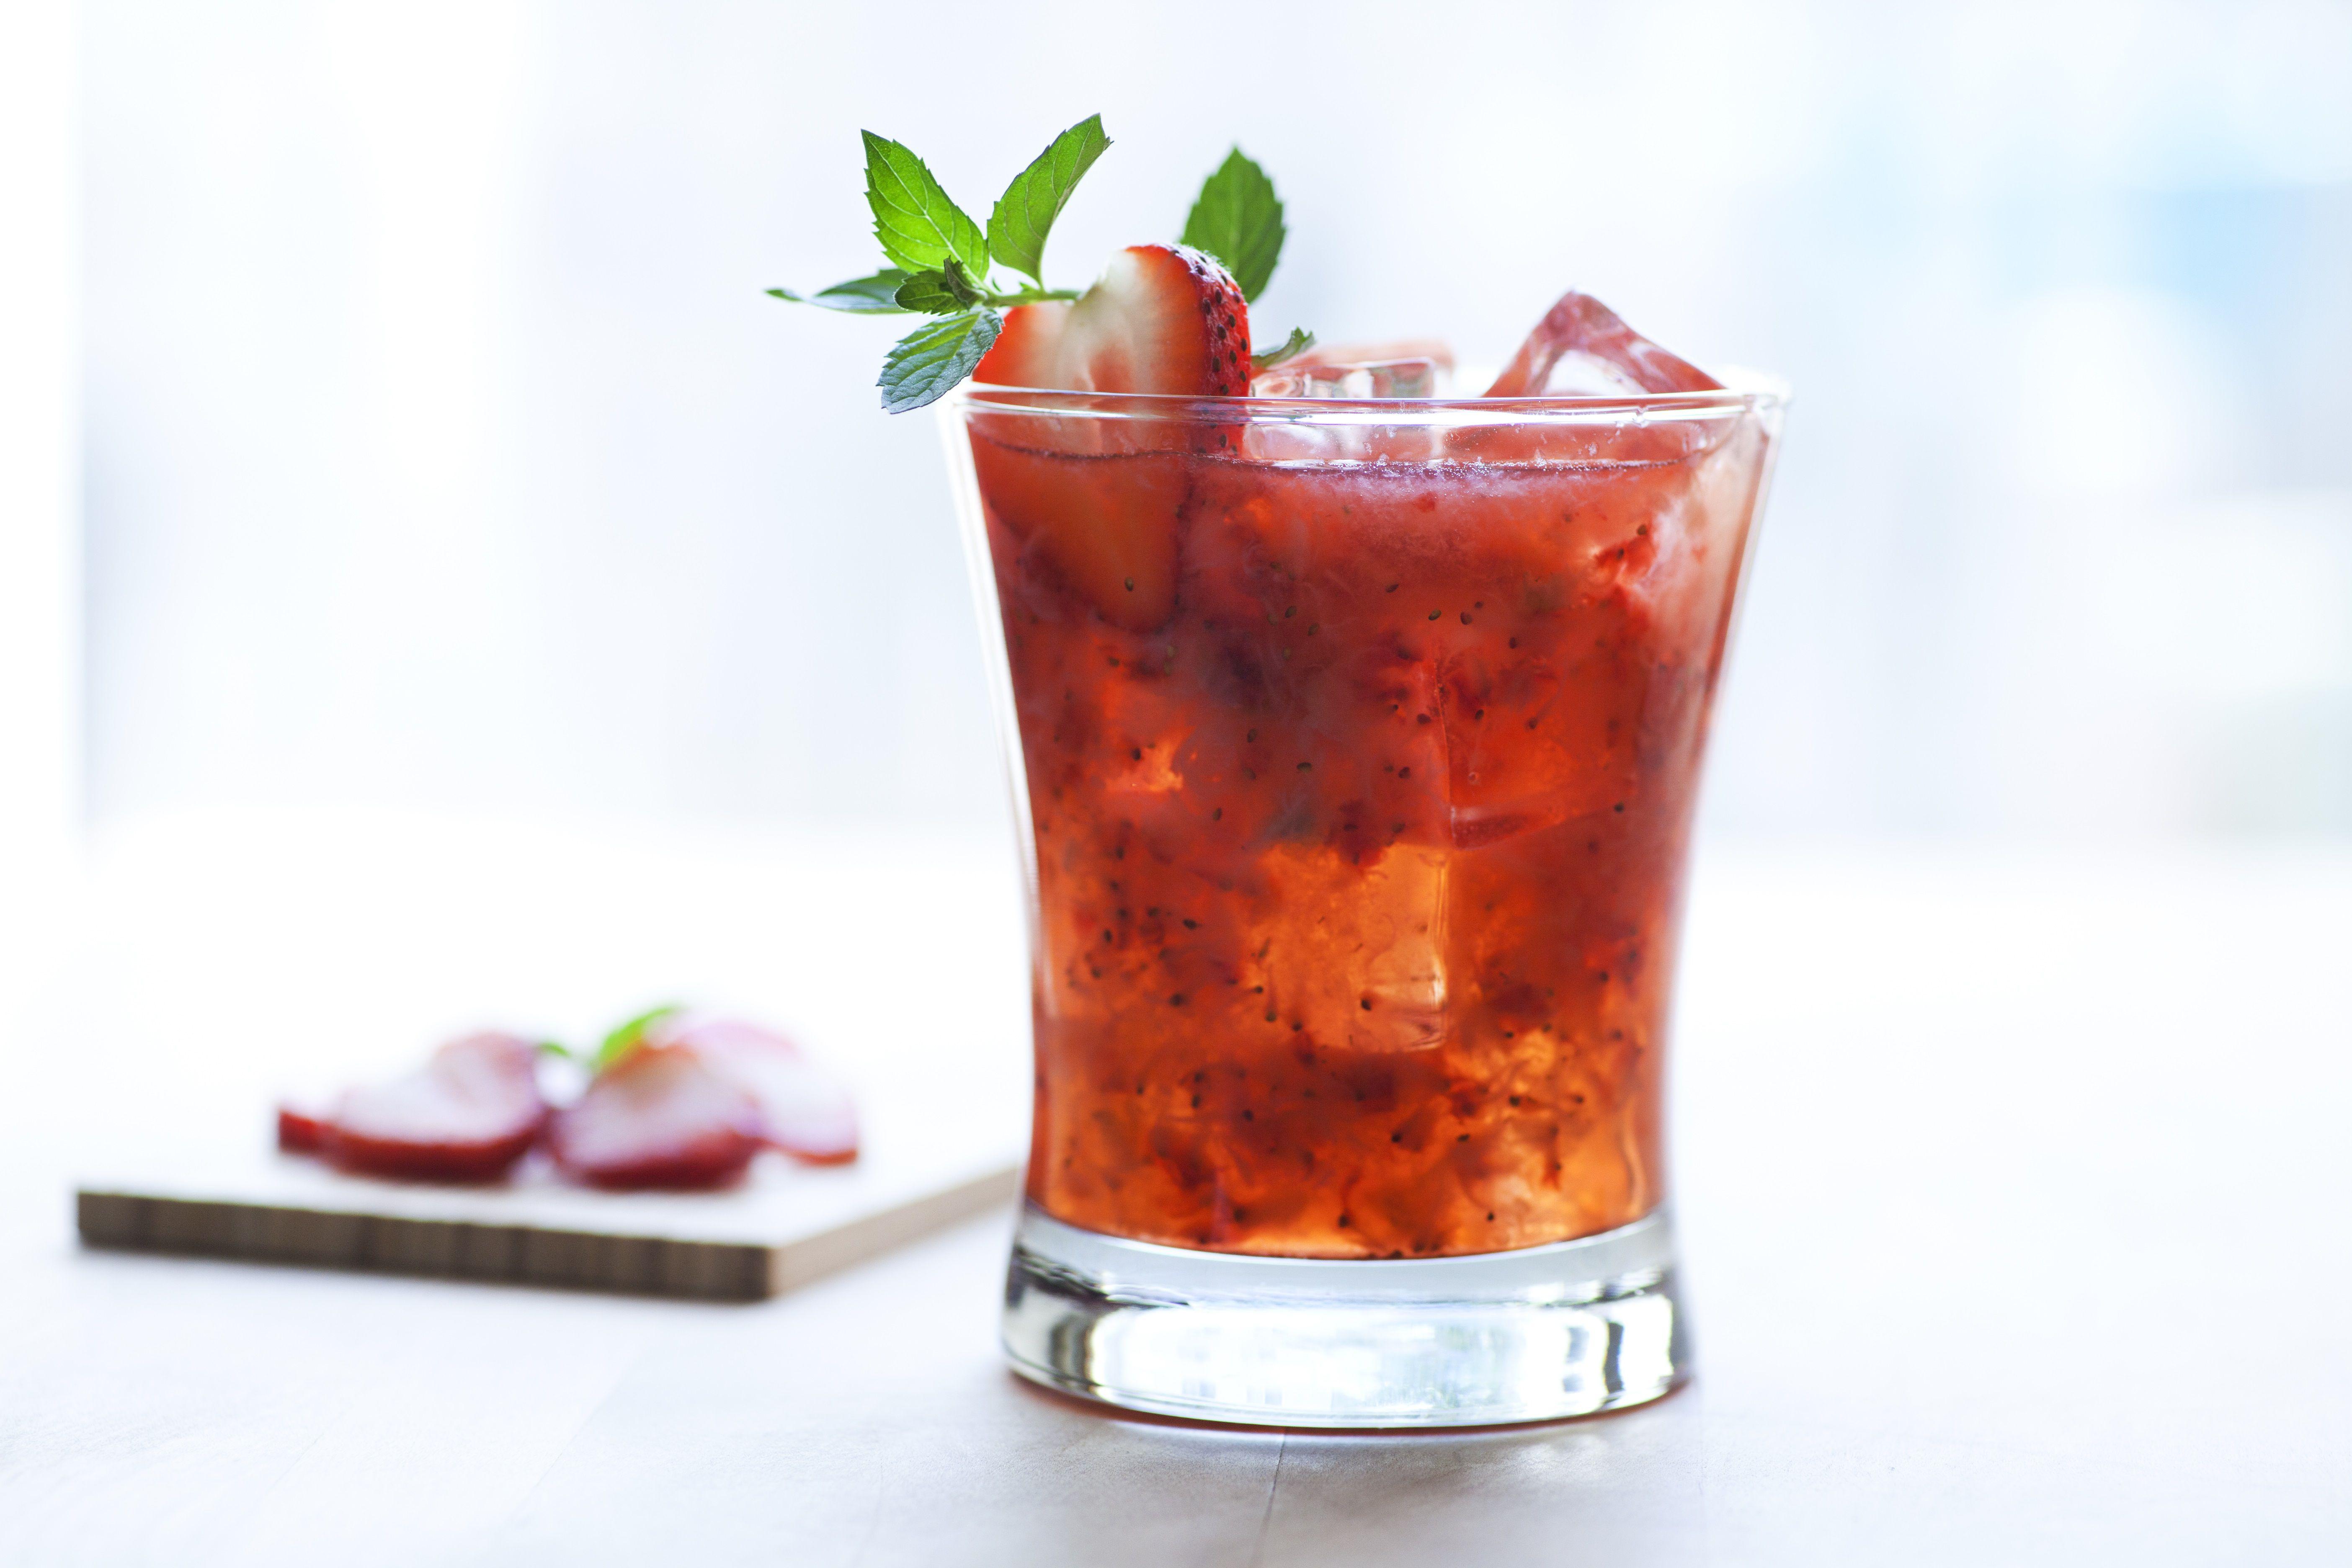 Kentucky Kiss Strawberry Cocktail